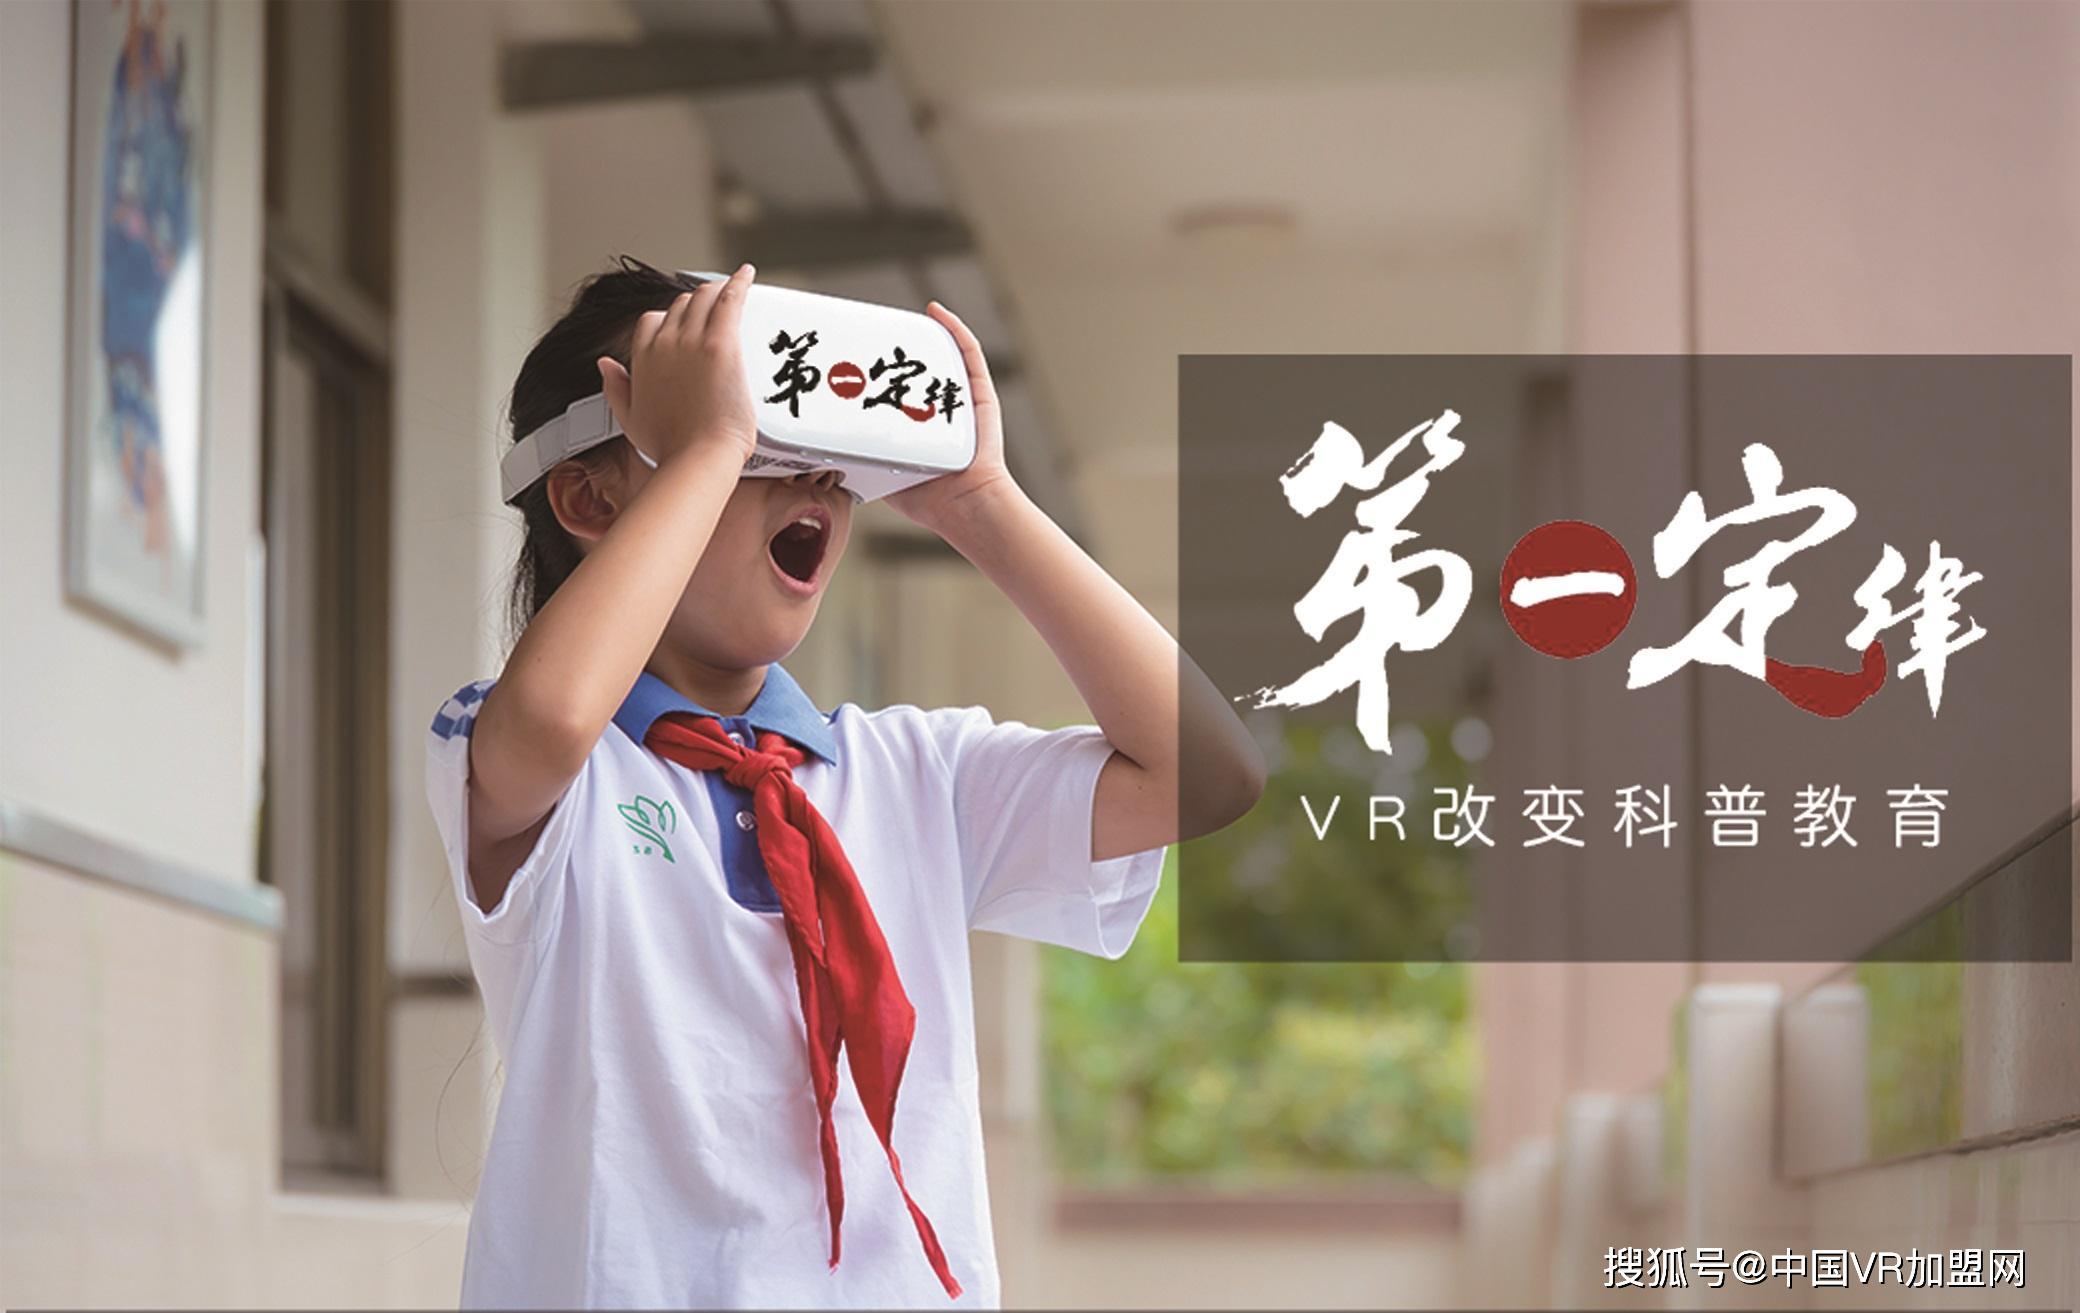 VR心理健康训练实训室是否成为中小学未来的标配